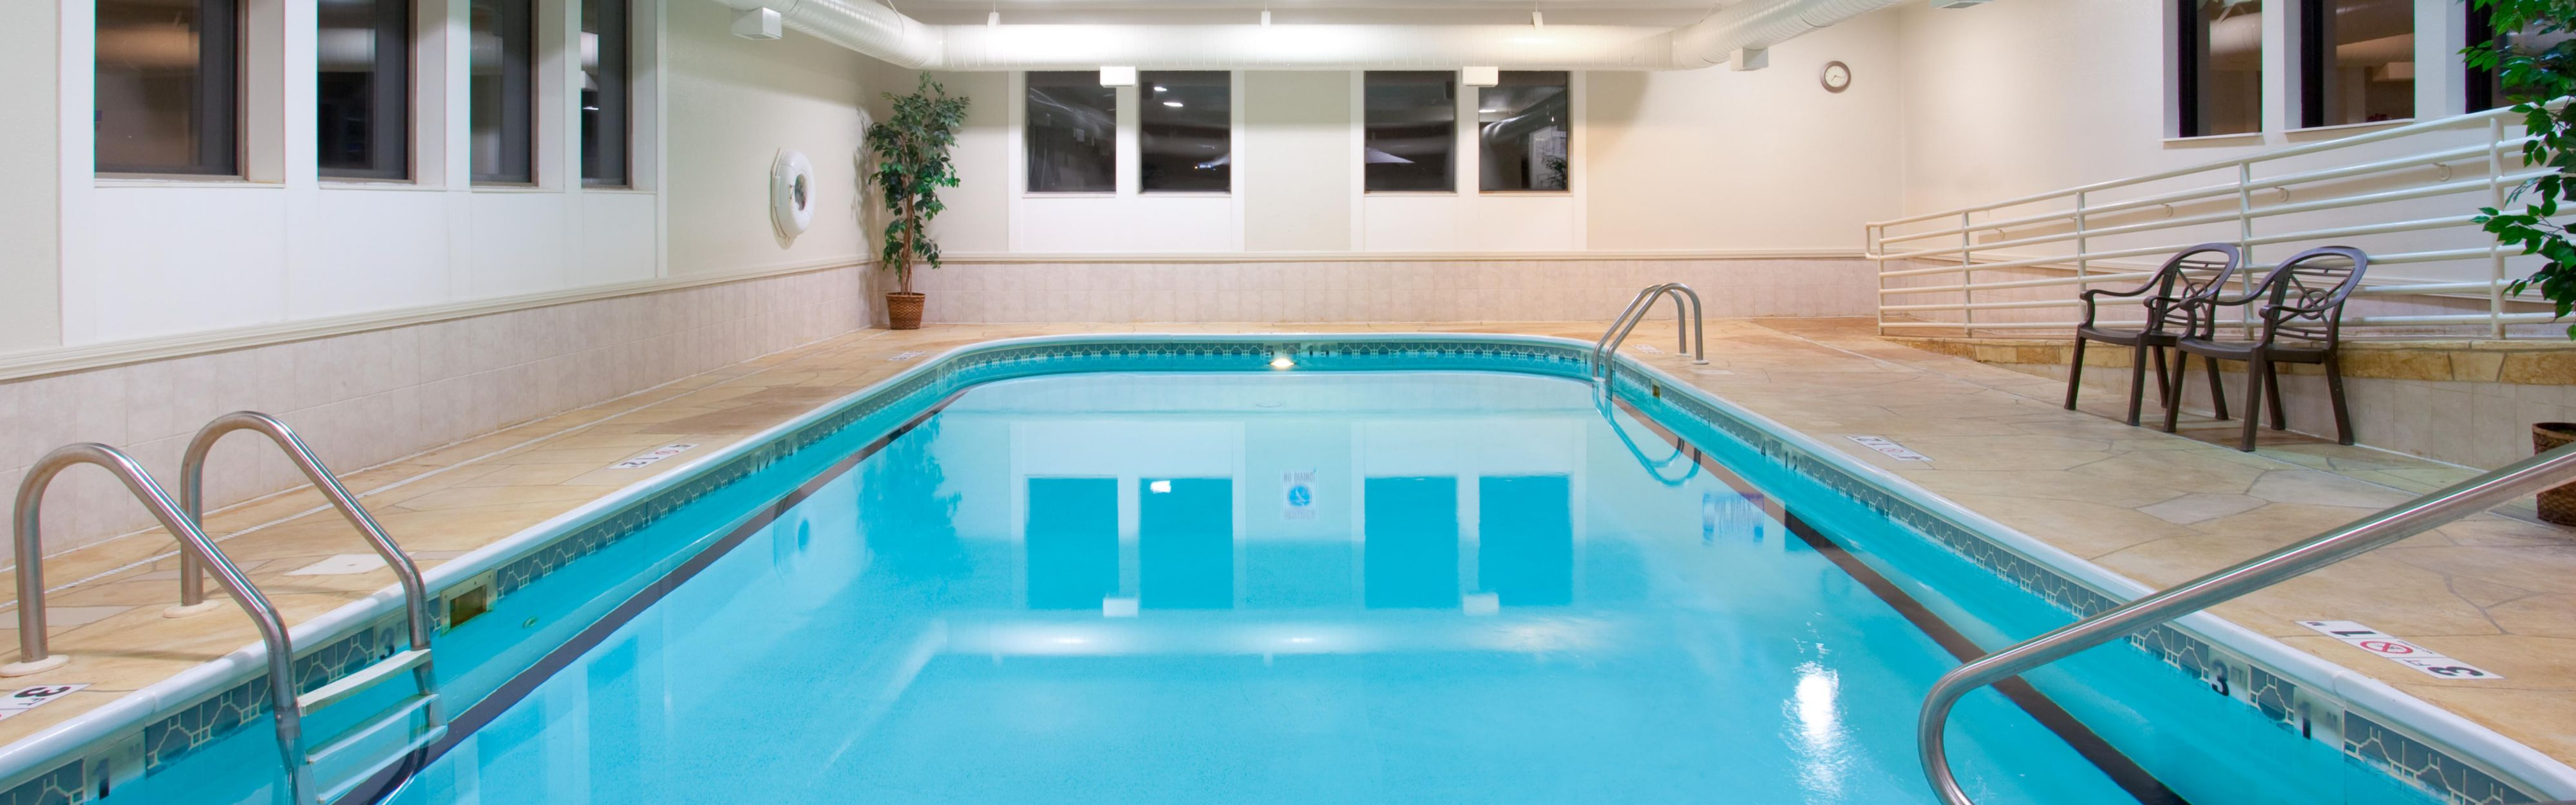 Holiday Inn Express & Suites Bourbonnais (Kankakee/Bradley) image 2